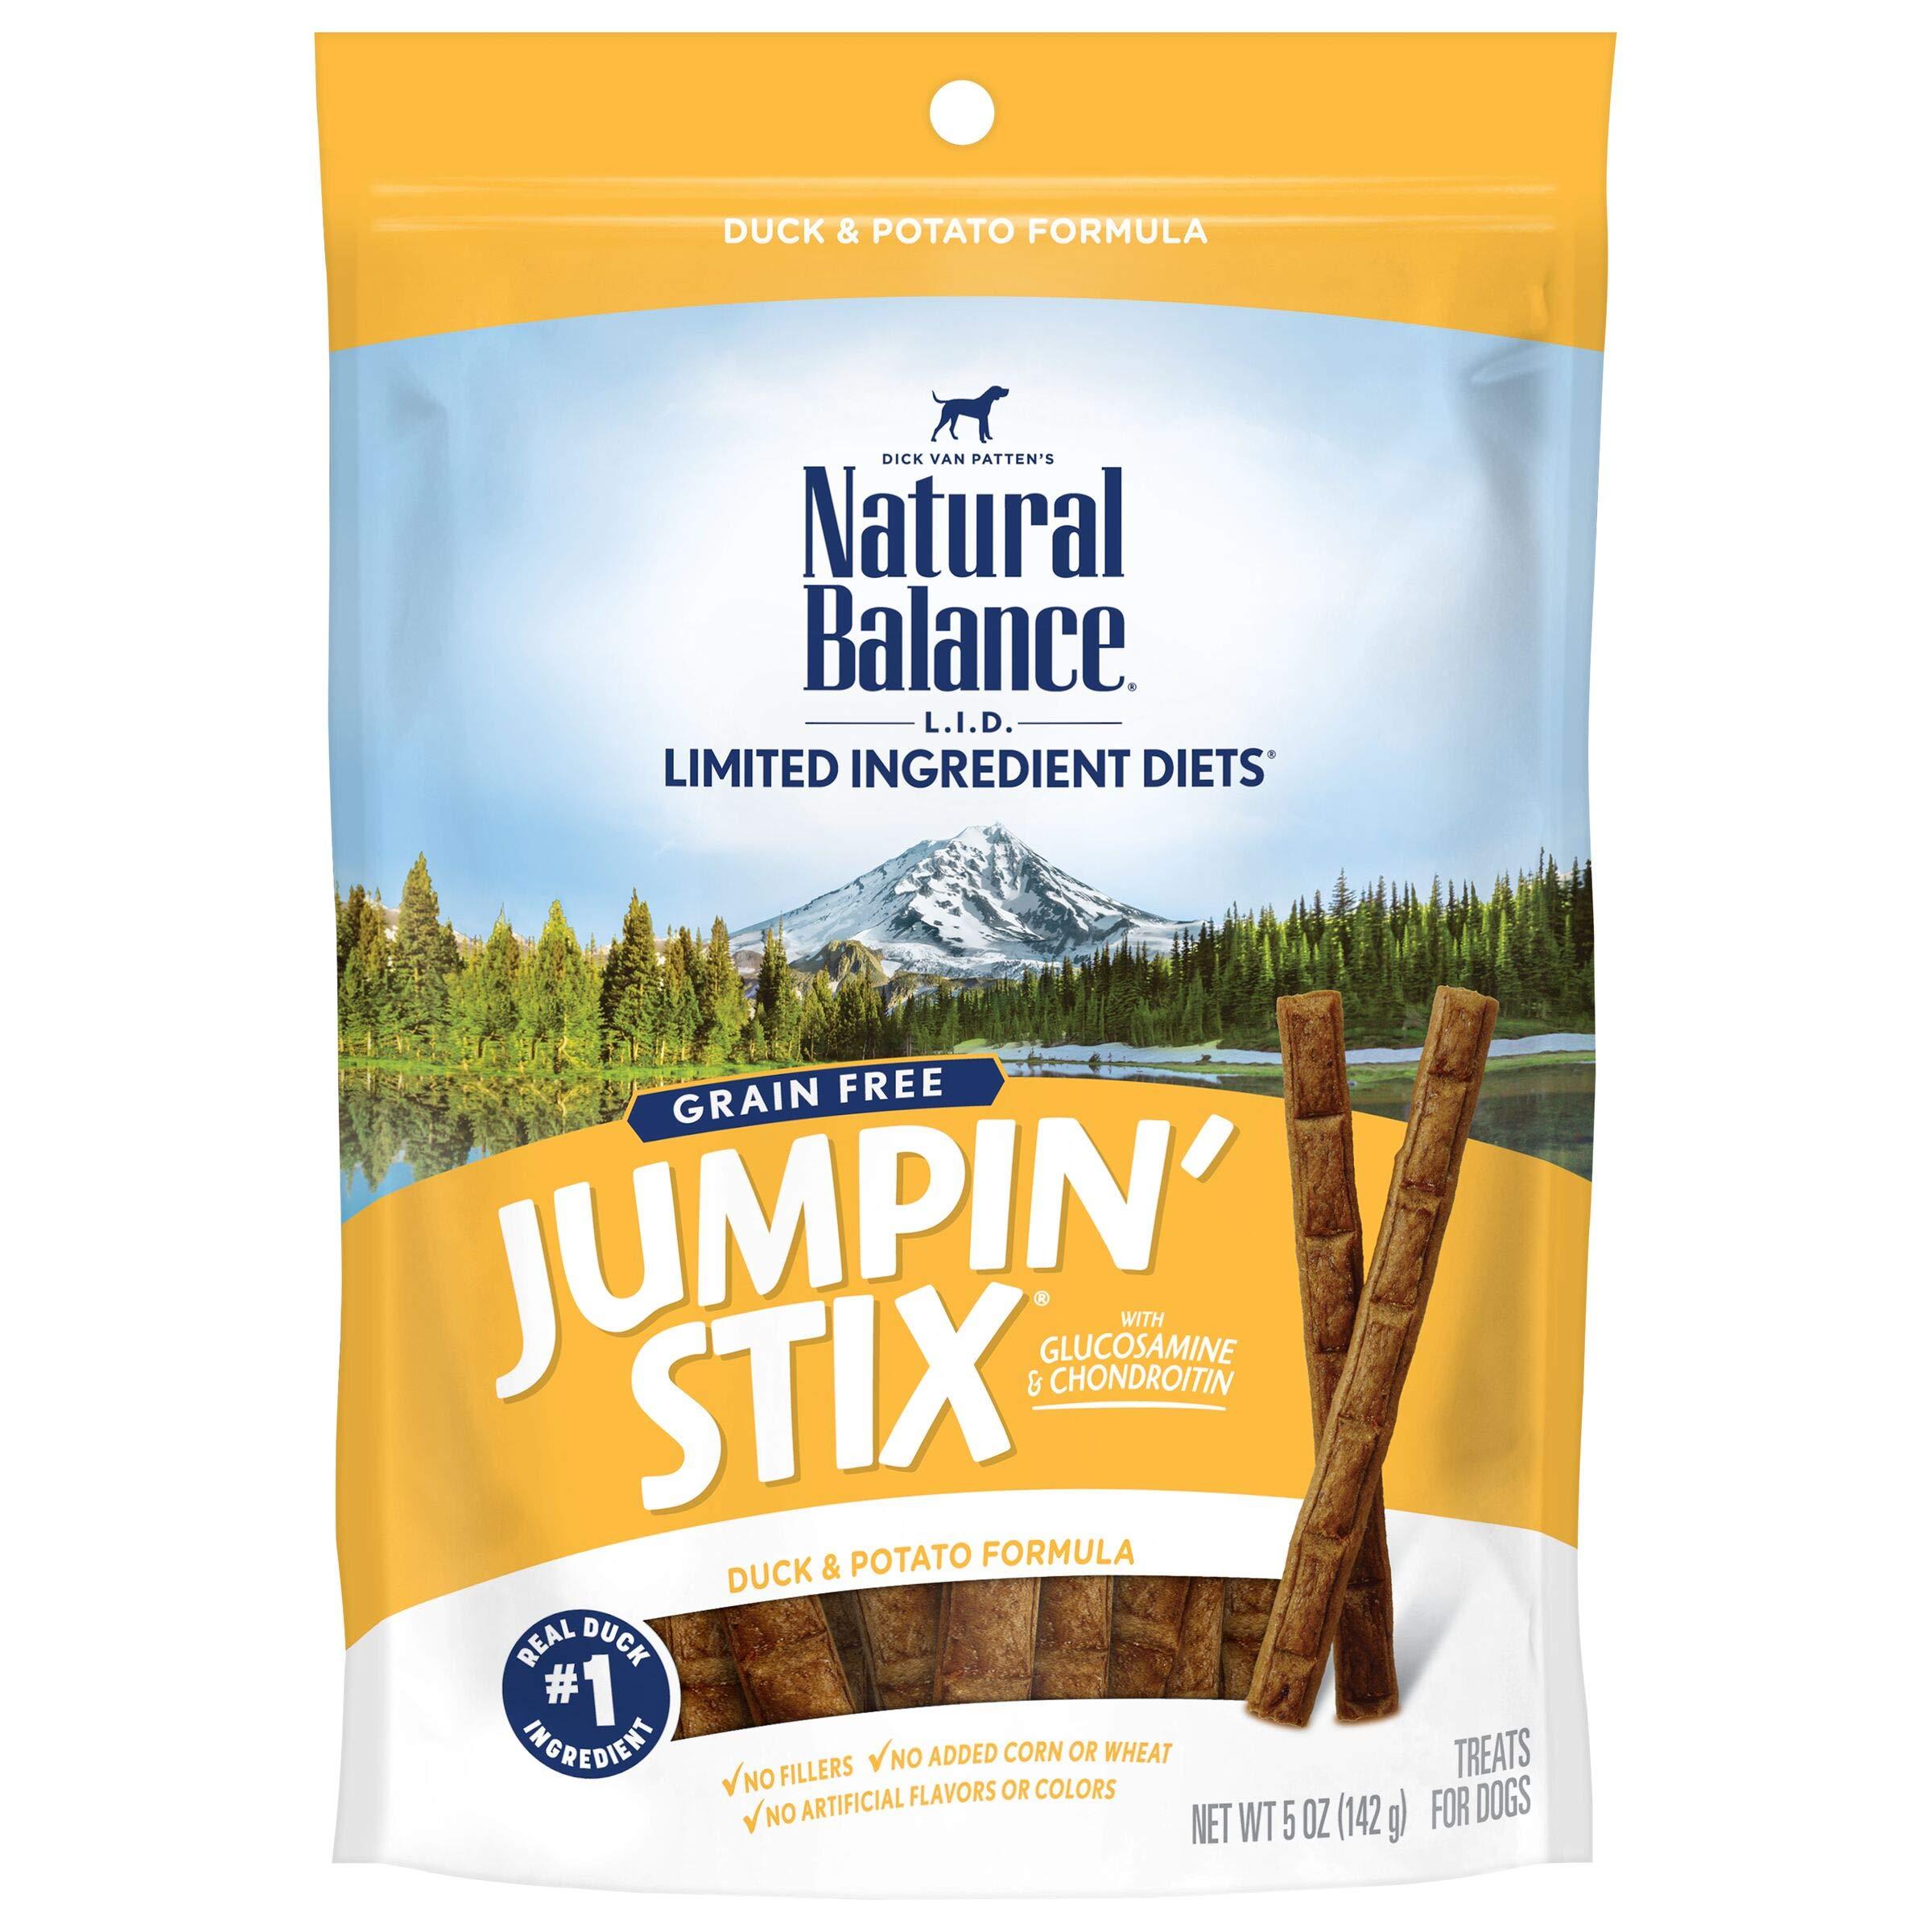 Natural Balance L.I.D. Limited Ingredient Diets Jumpin' Stix Dog Treats, Duck & Potato Formula, 5 Ounces, Grain Free